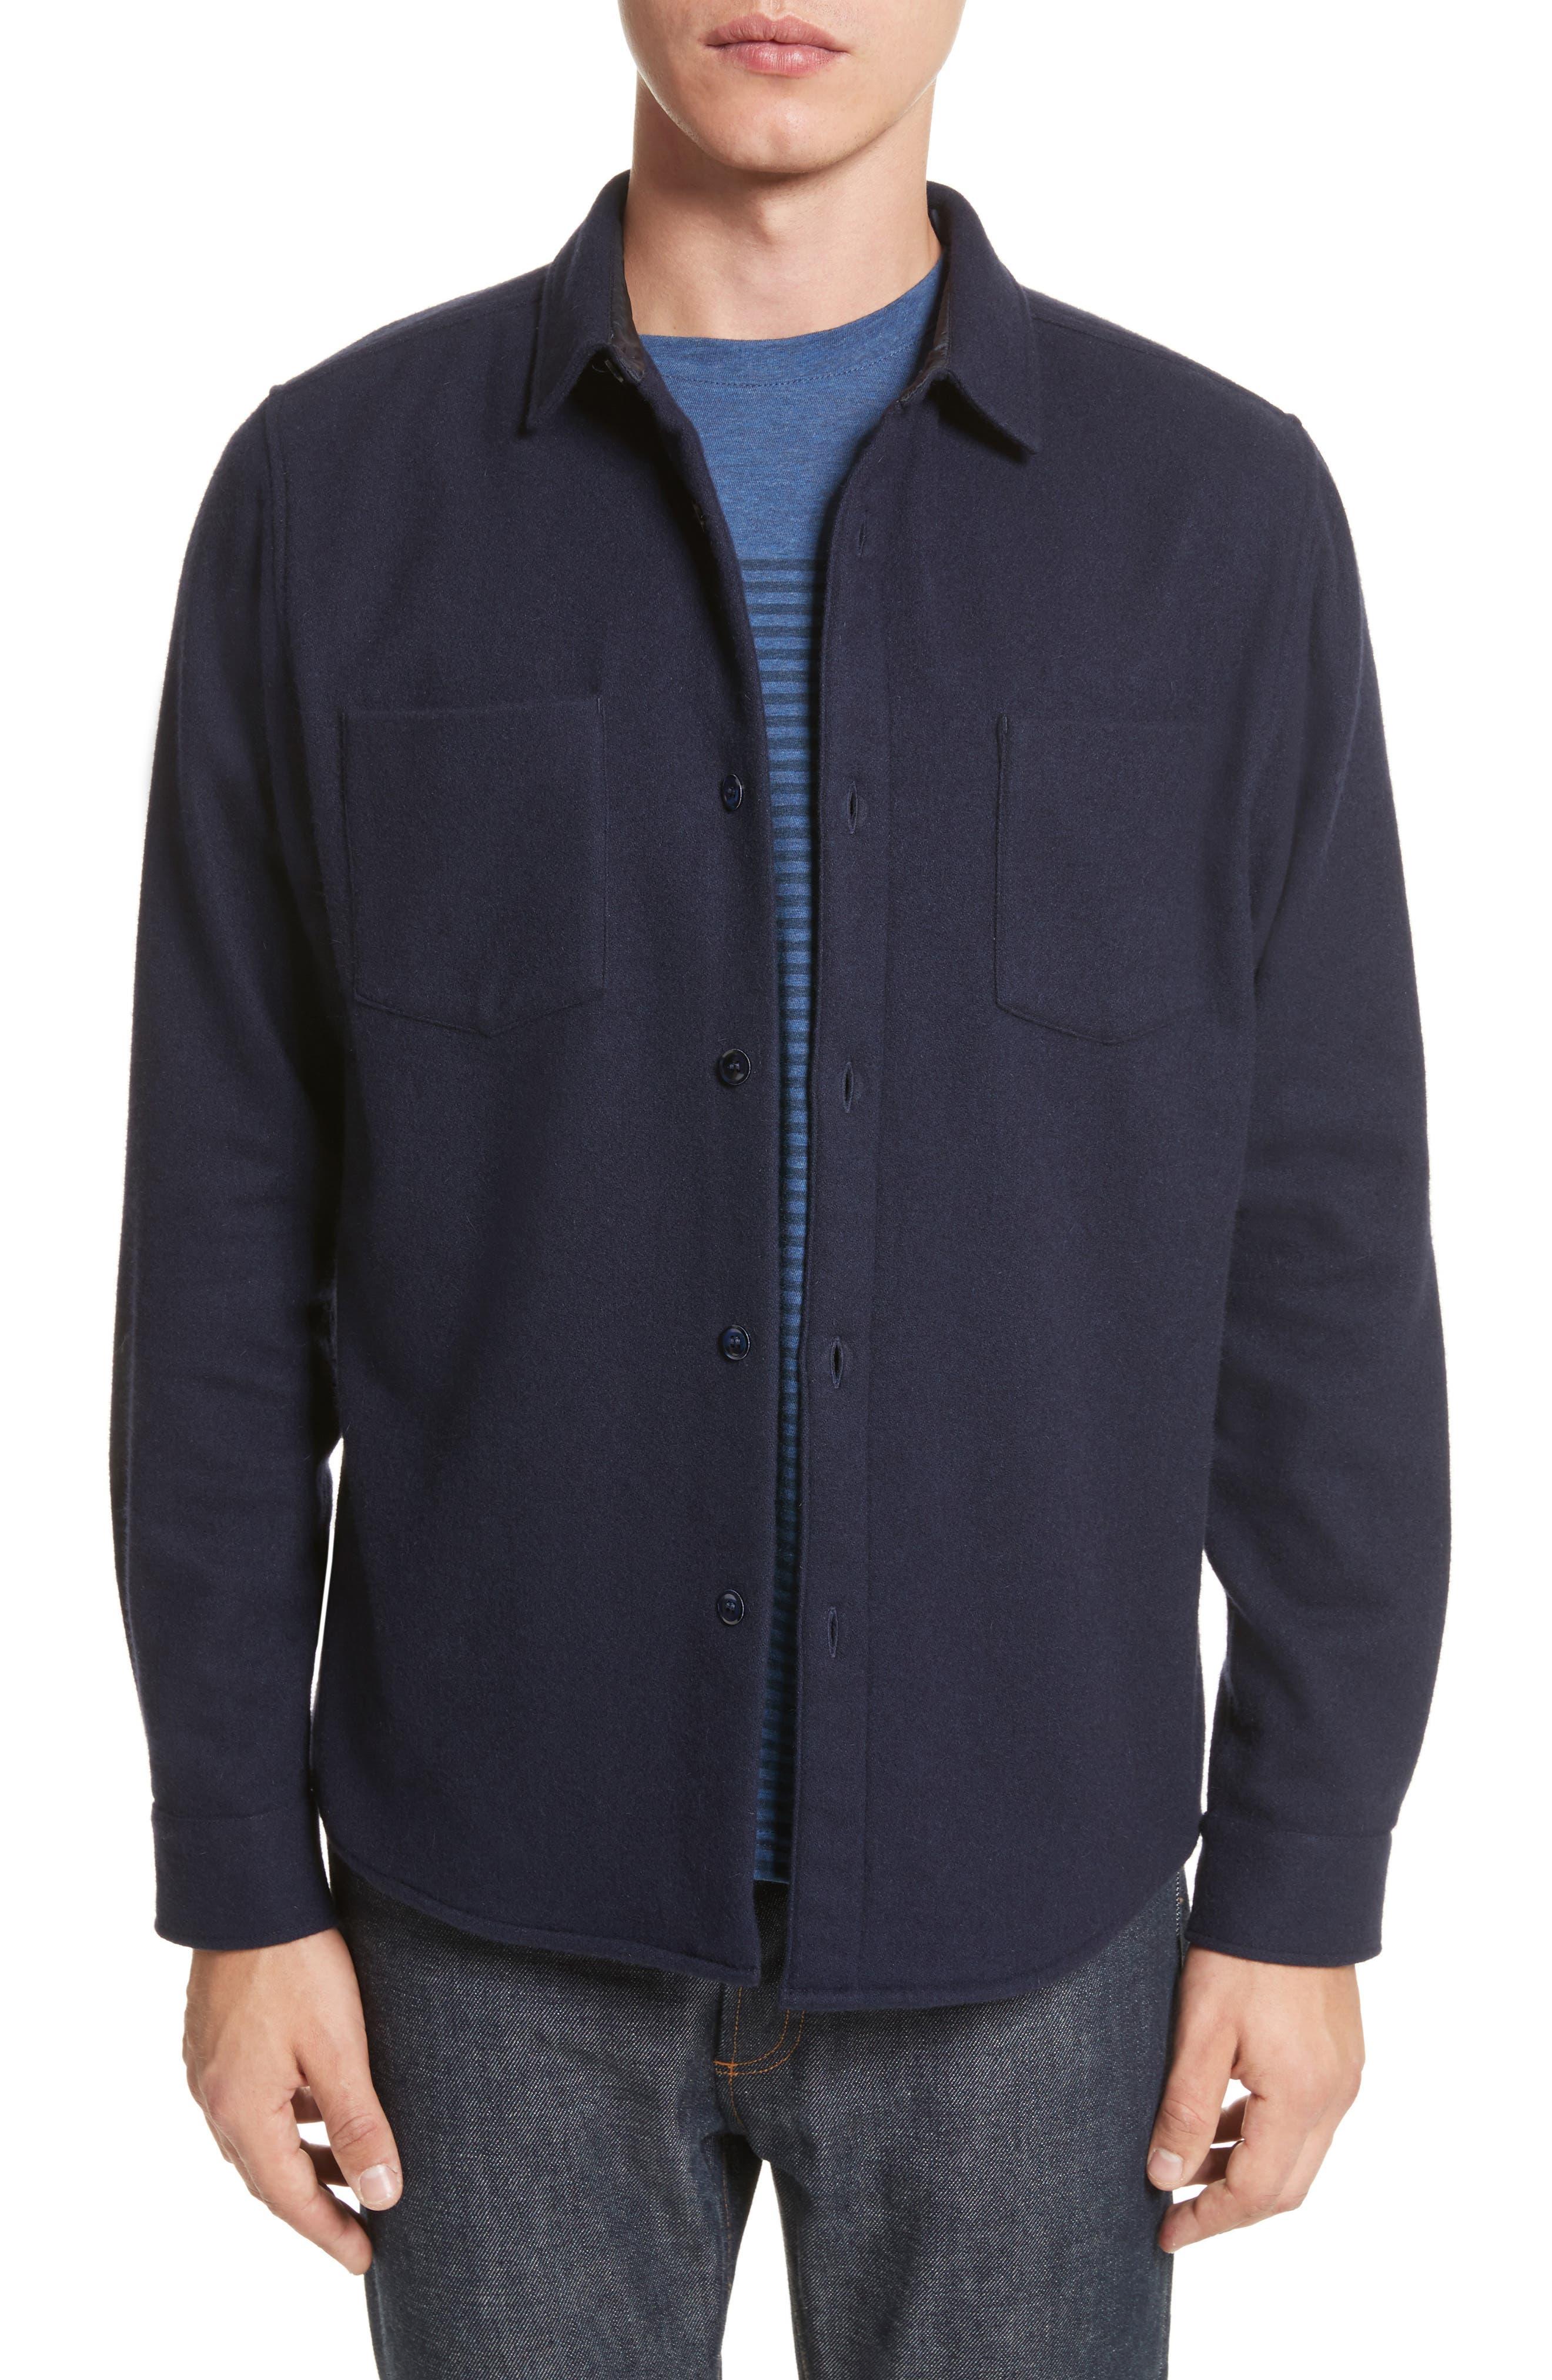 Main Image - A.P.C. Fritz Wool Blend Shirt Jacket